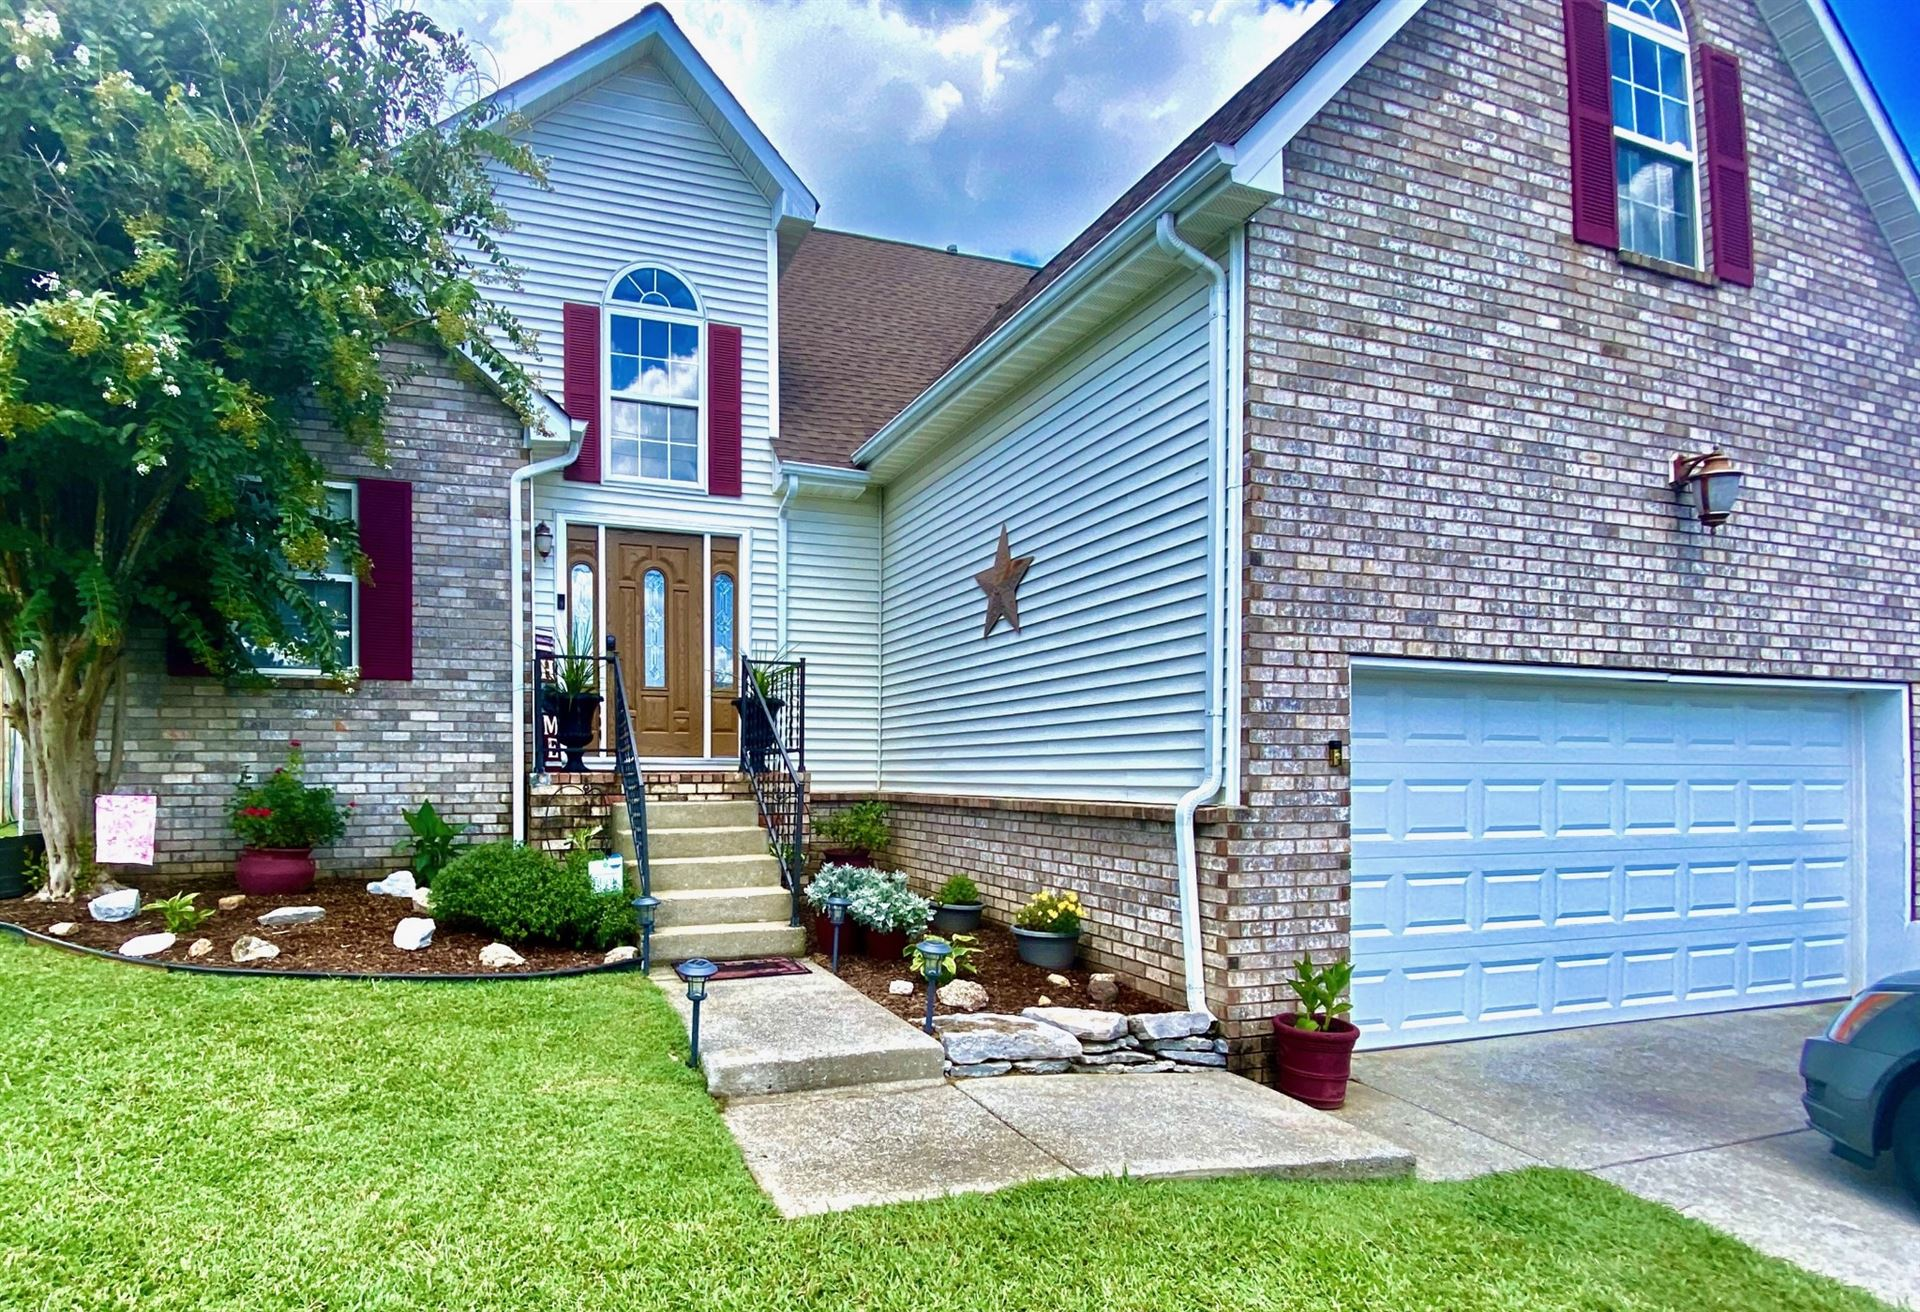 806 Chaney Woods Dr, La Vergne, TN 37086 - MLS#: 2190426